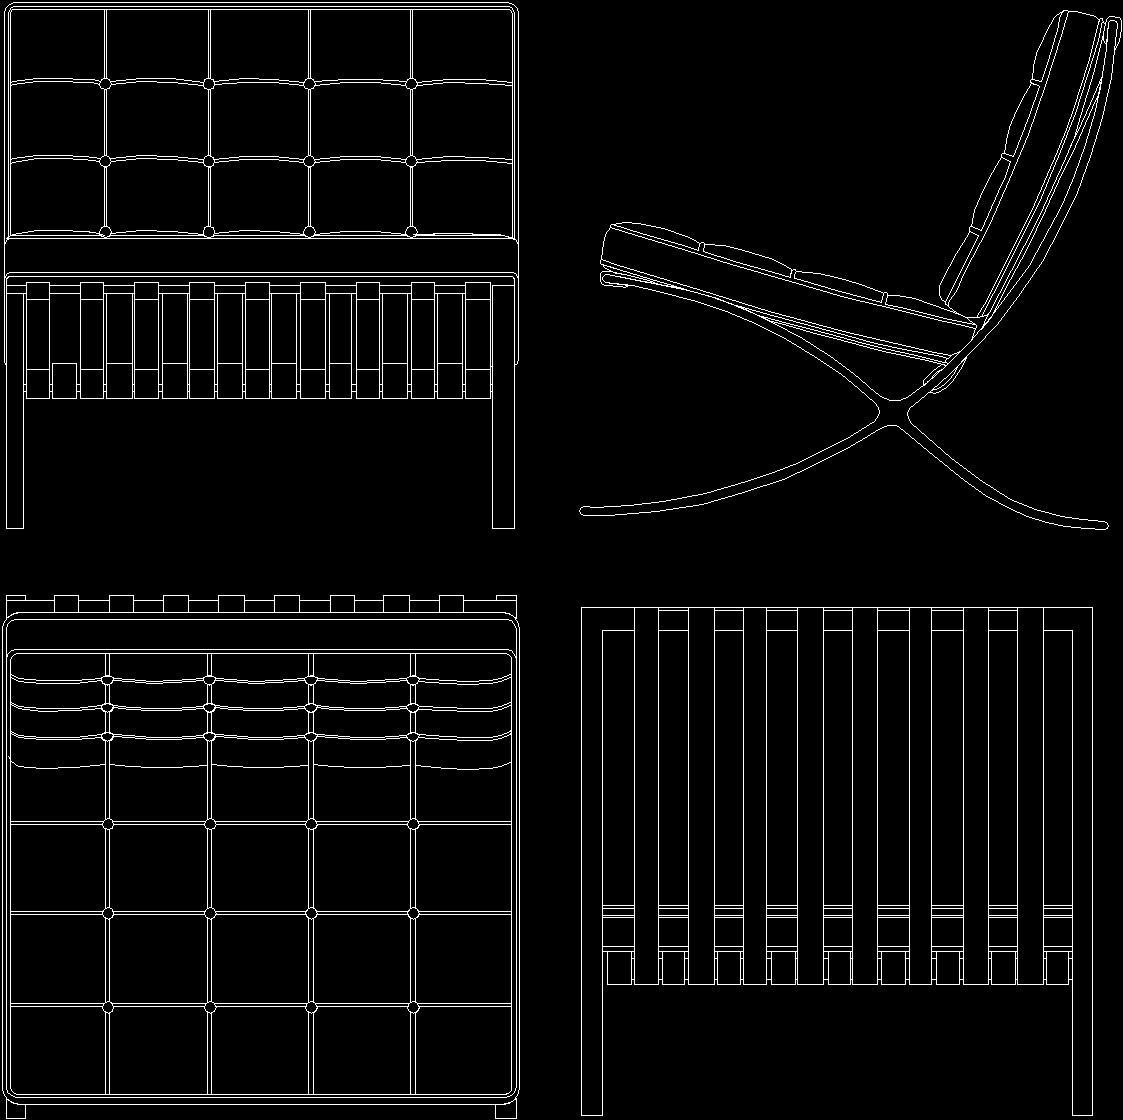 Mies Van Der Rohe The Barcelona Chair Dwg Block For Autocad  # Muebles Mies Van Der Rohe Autocad